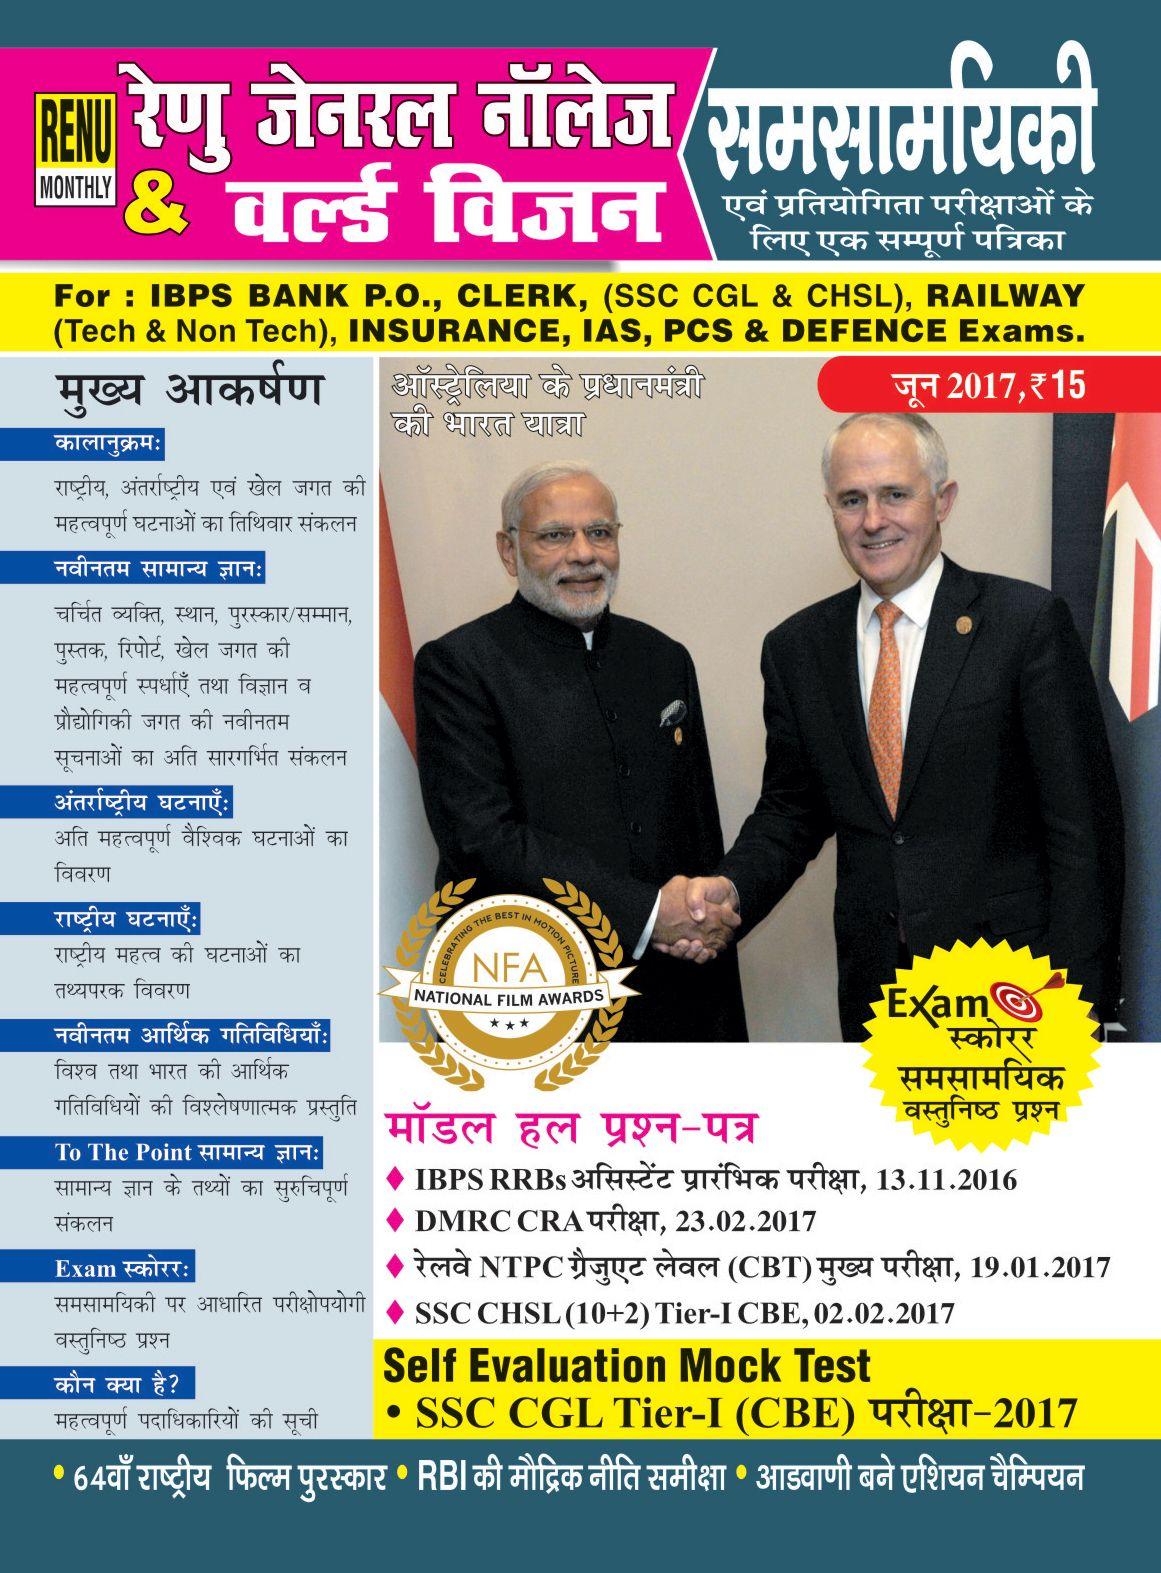 Official Website Of Kiranprakashan Leading Publisher Of Bank Ssc